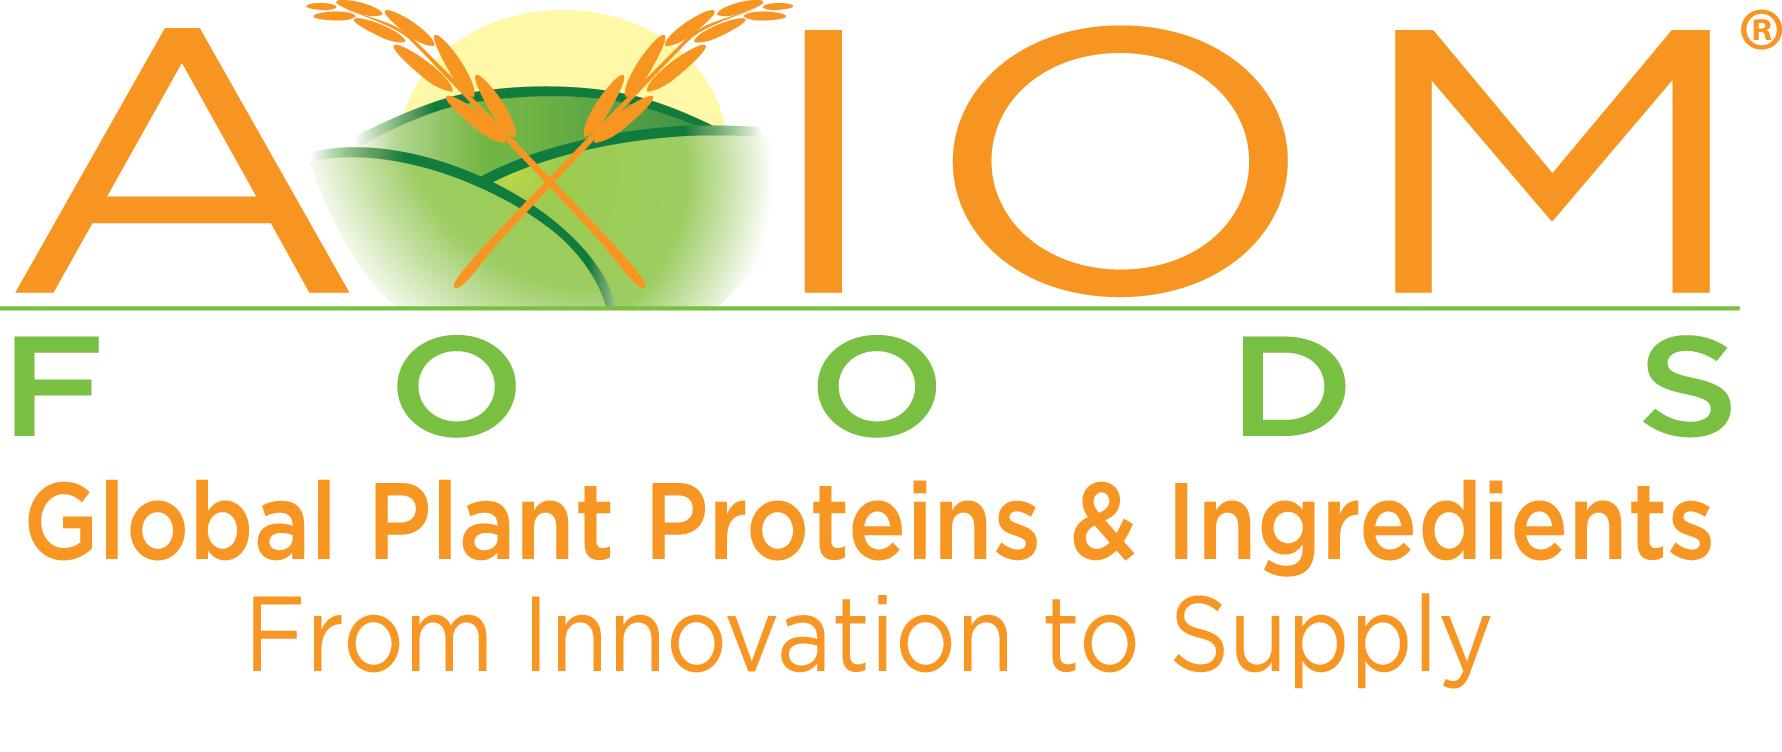 Axiom Foods - sponsoring BevNET Live Summer 2018